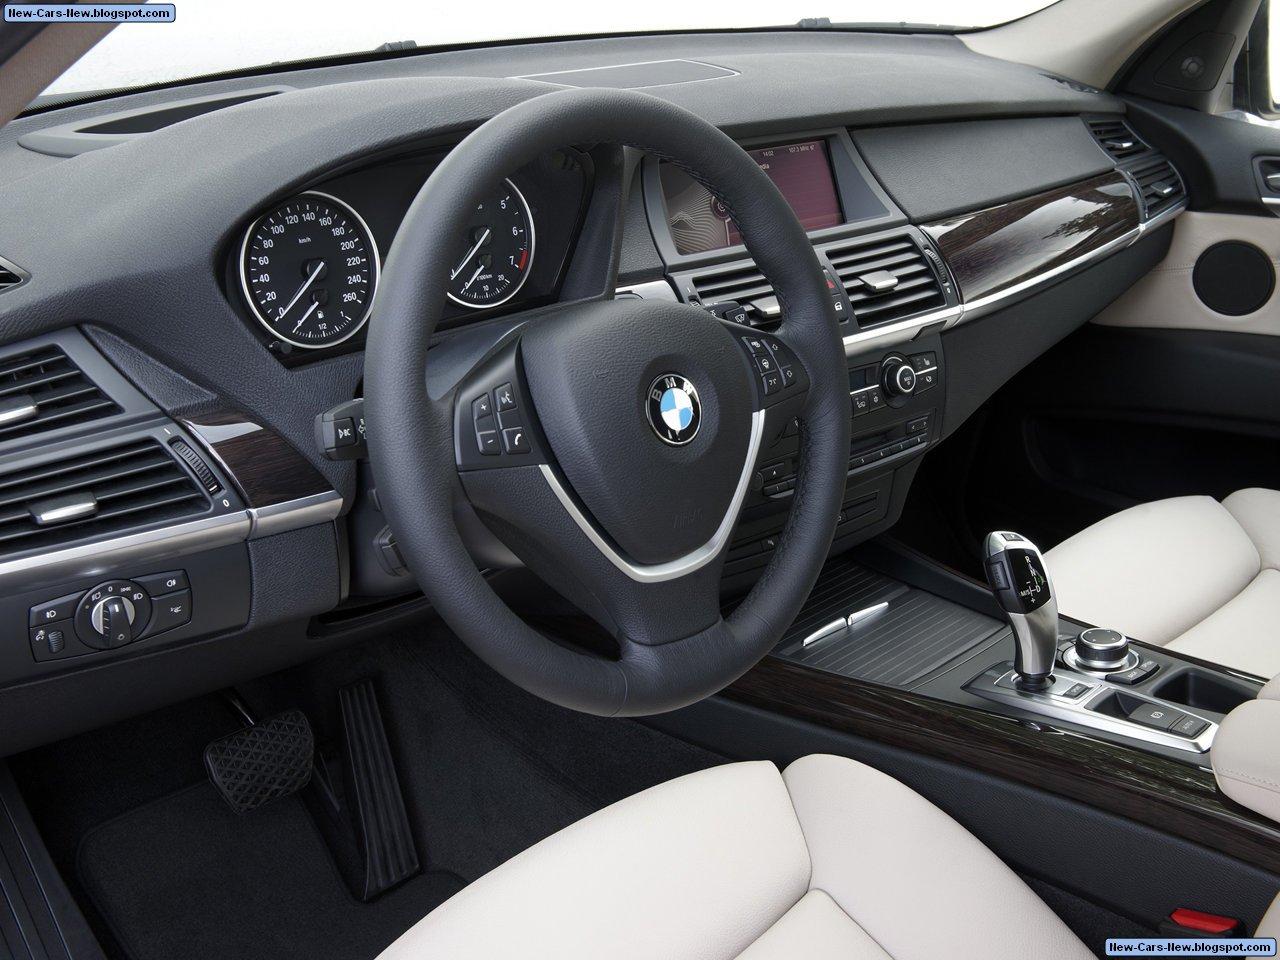 http://3.bp.blogspot.com/_U4w592tUDHM/TCG55D2DXxI/AAAAAAAAC4Q/6ySbkOkgI3c/s1600/BMW-X5_2011_1280x960_wallpaper_05.jpg